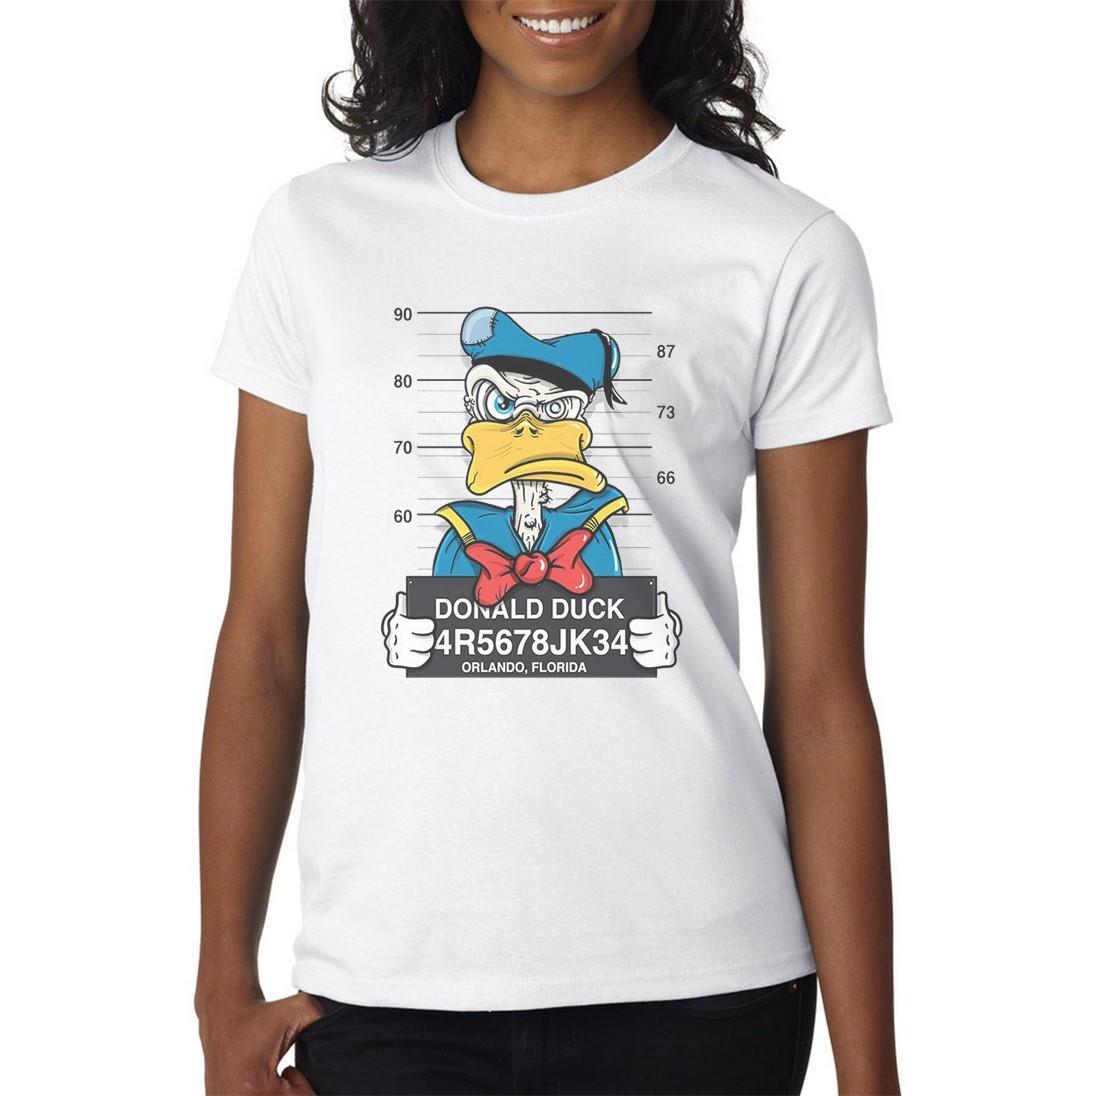 Disney-Mugshot-T-Shirt-Mens-Womens-Funny-T-Shirt-Donald-Goofy-Pluto-Daisy